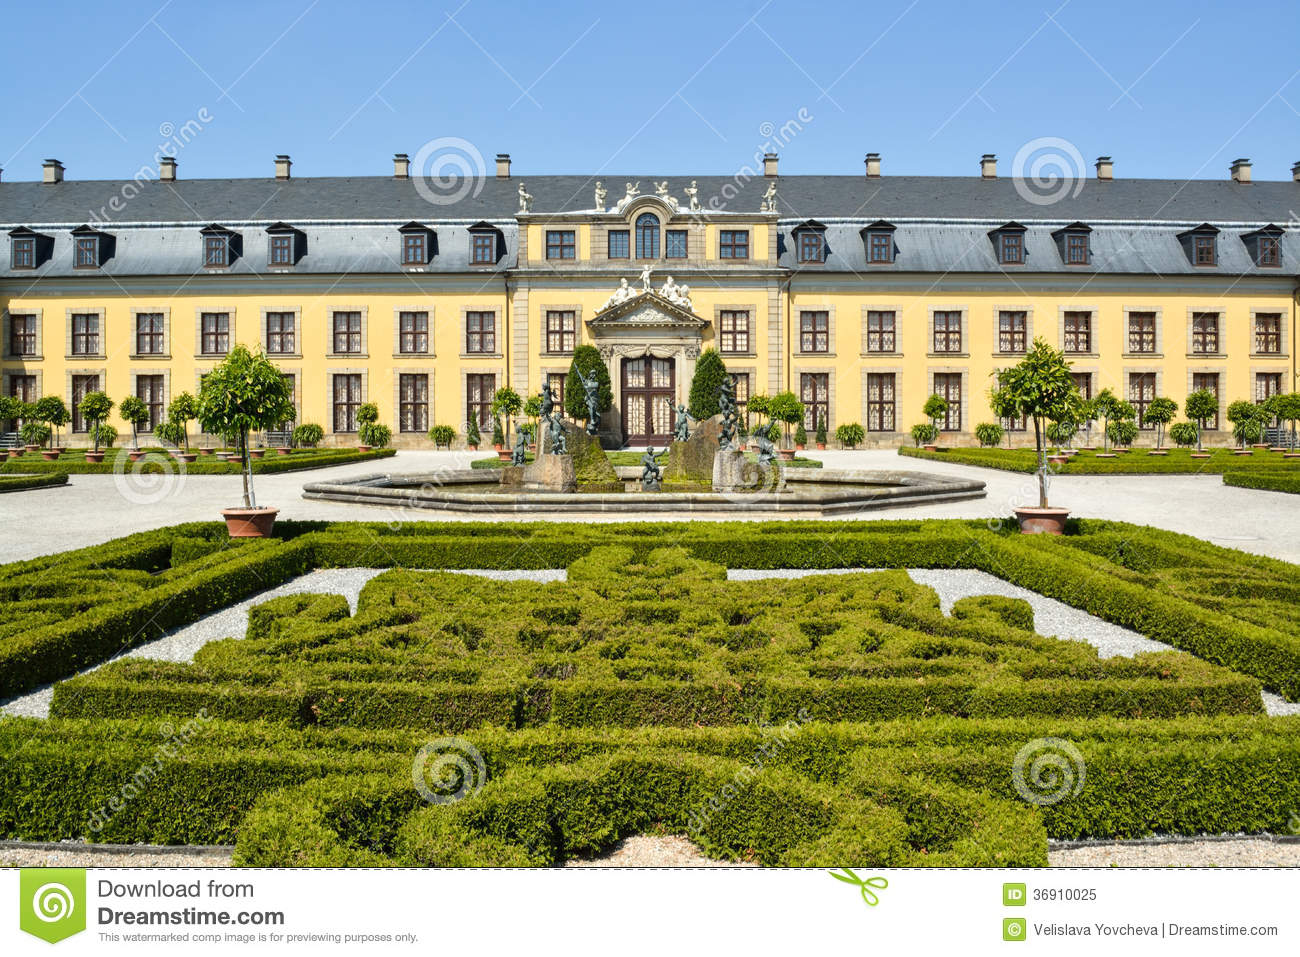 Herrenhausen Castle And Gardens Royalty Free Stock Photo.